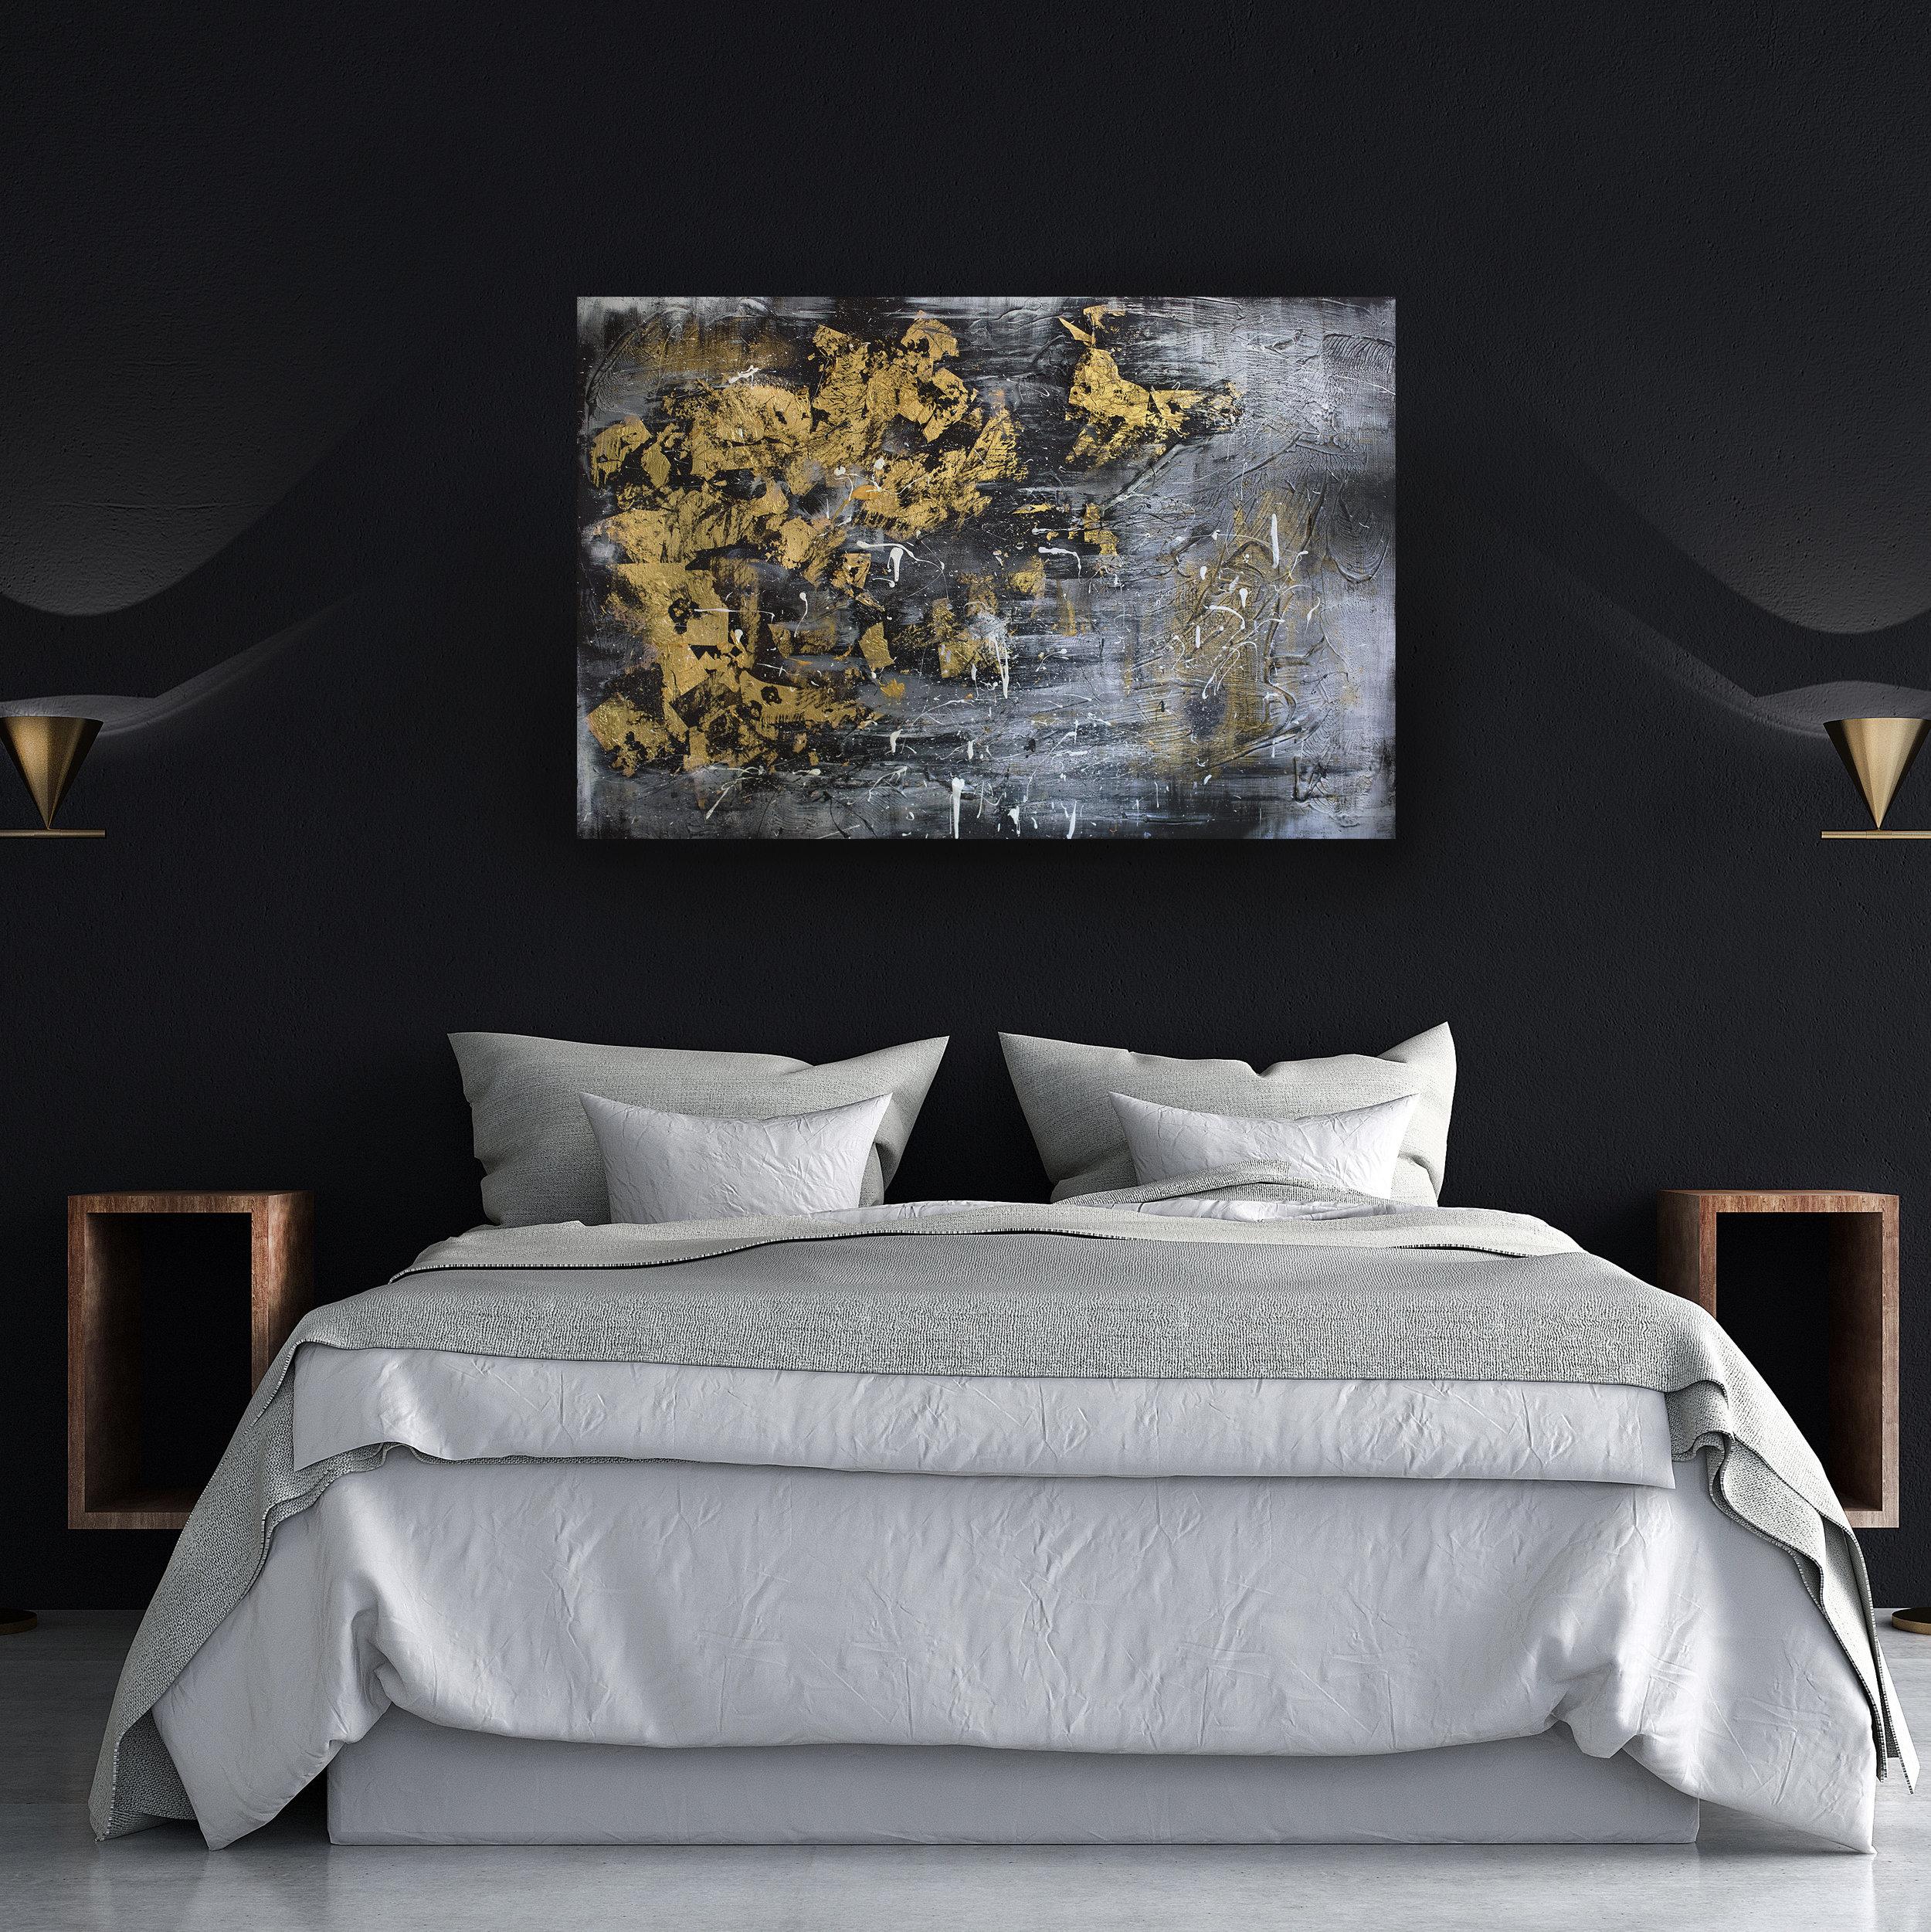 Golden_Scratches_Rooms.jpg